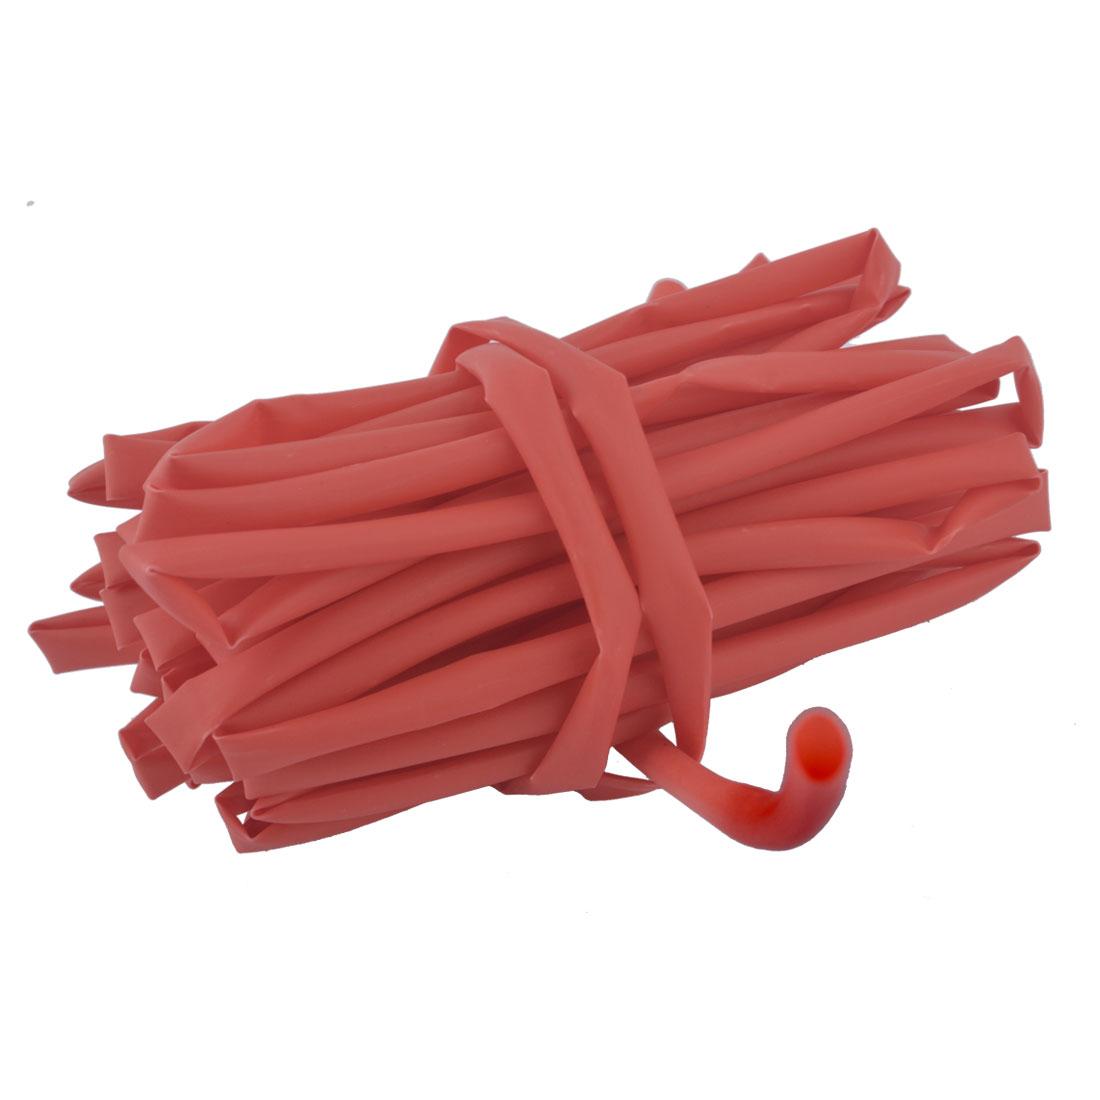 Polyolefin Sleeving Ratio 2:1 Shrink Heat Shrinkable Tube Red 5M